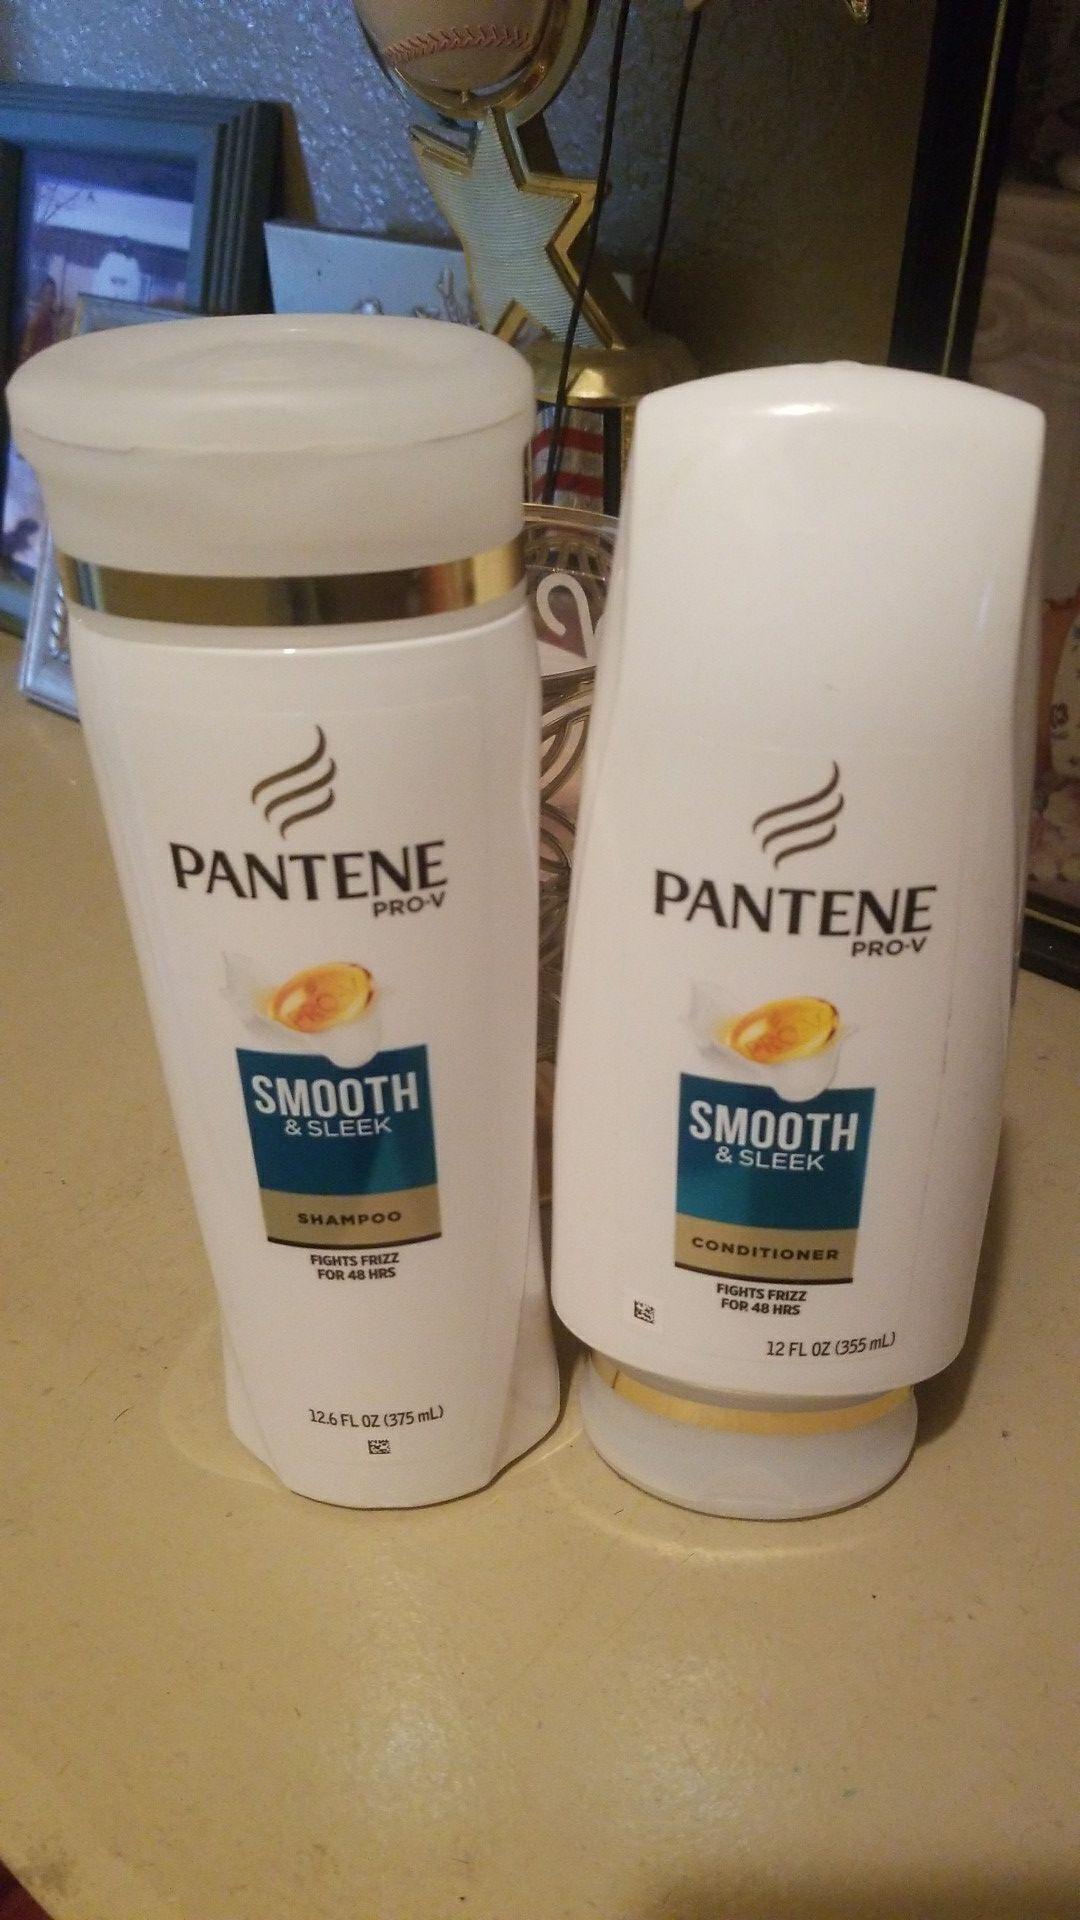 Pantene shampoo and conditioner set